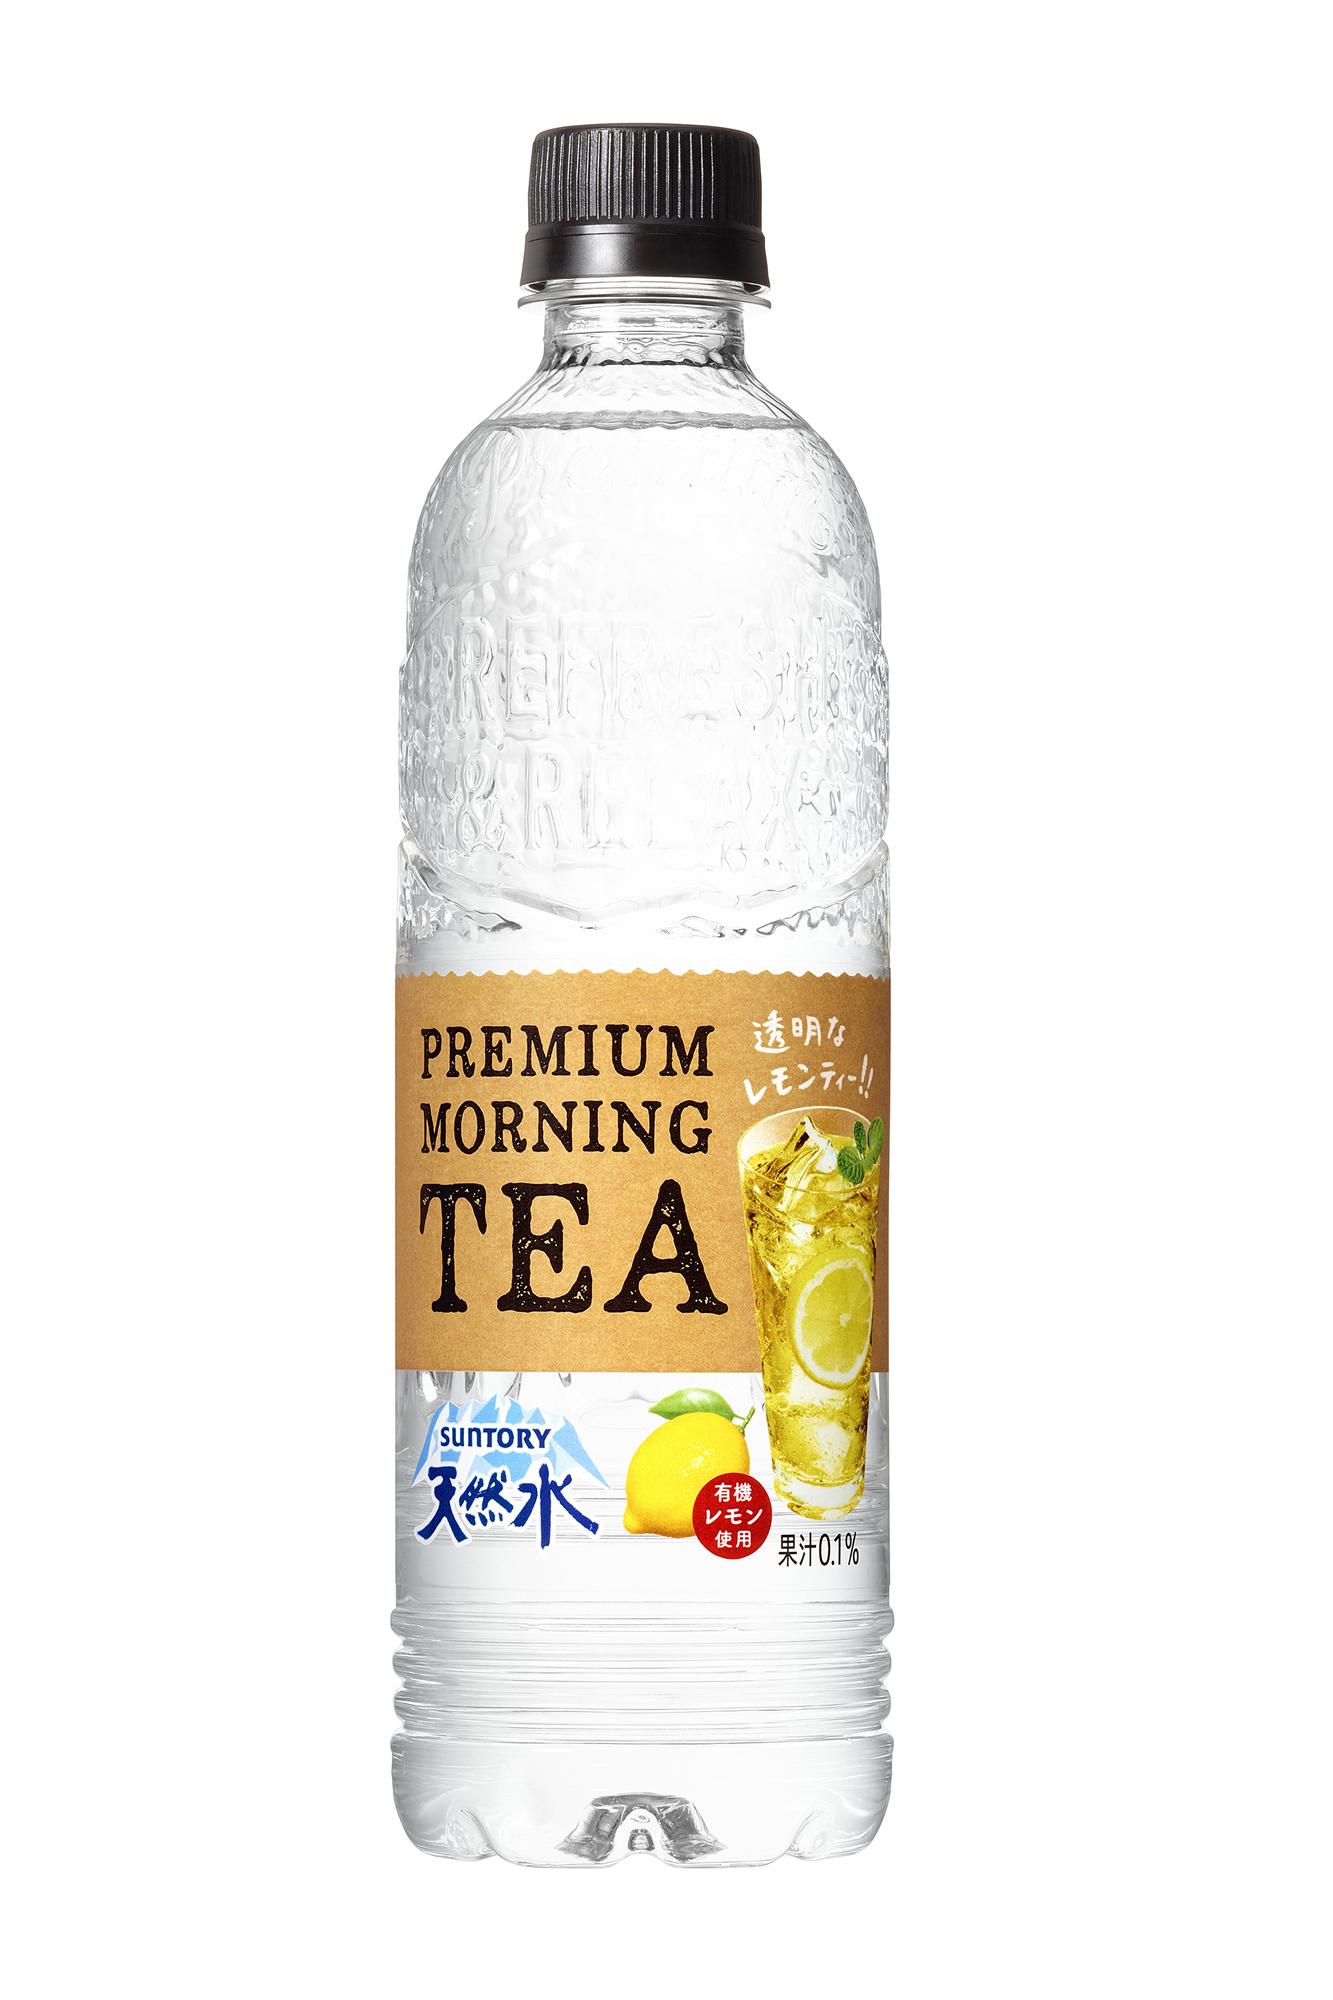 Image result for premium morning tea